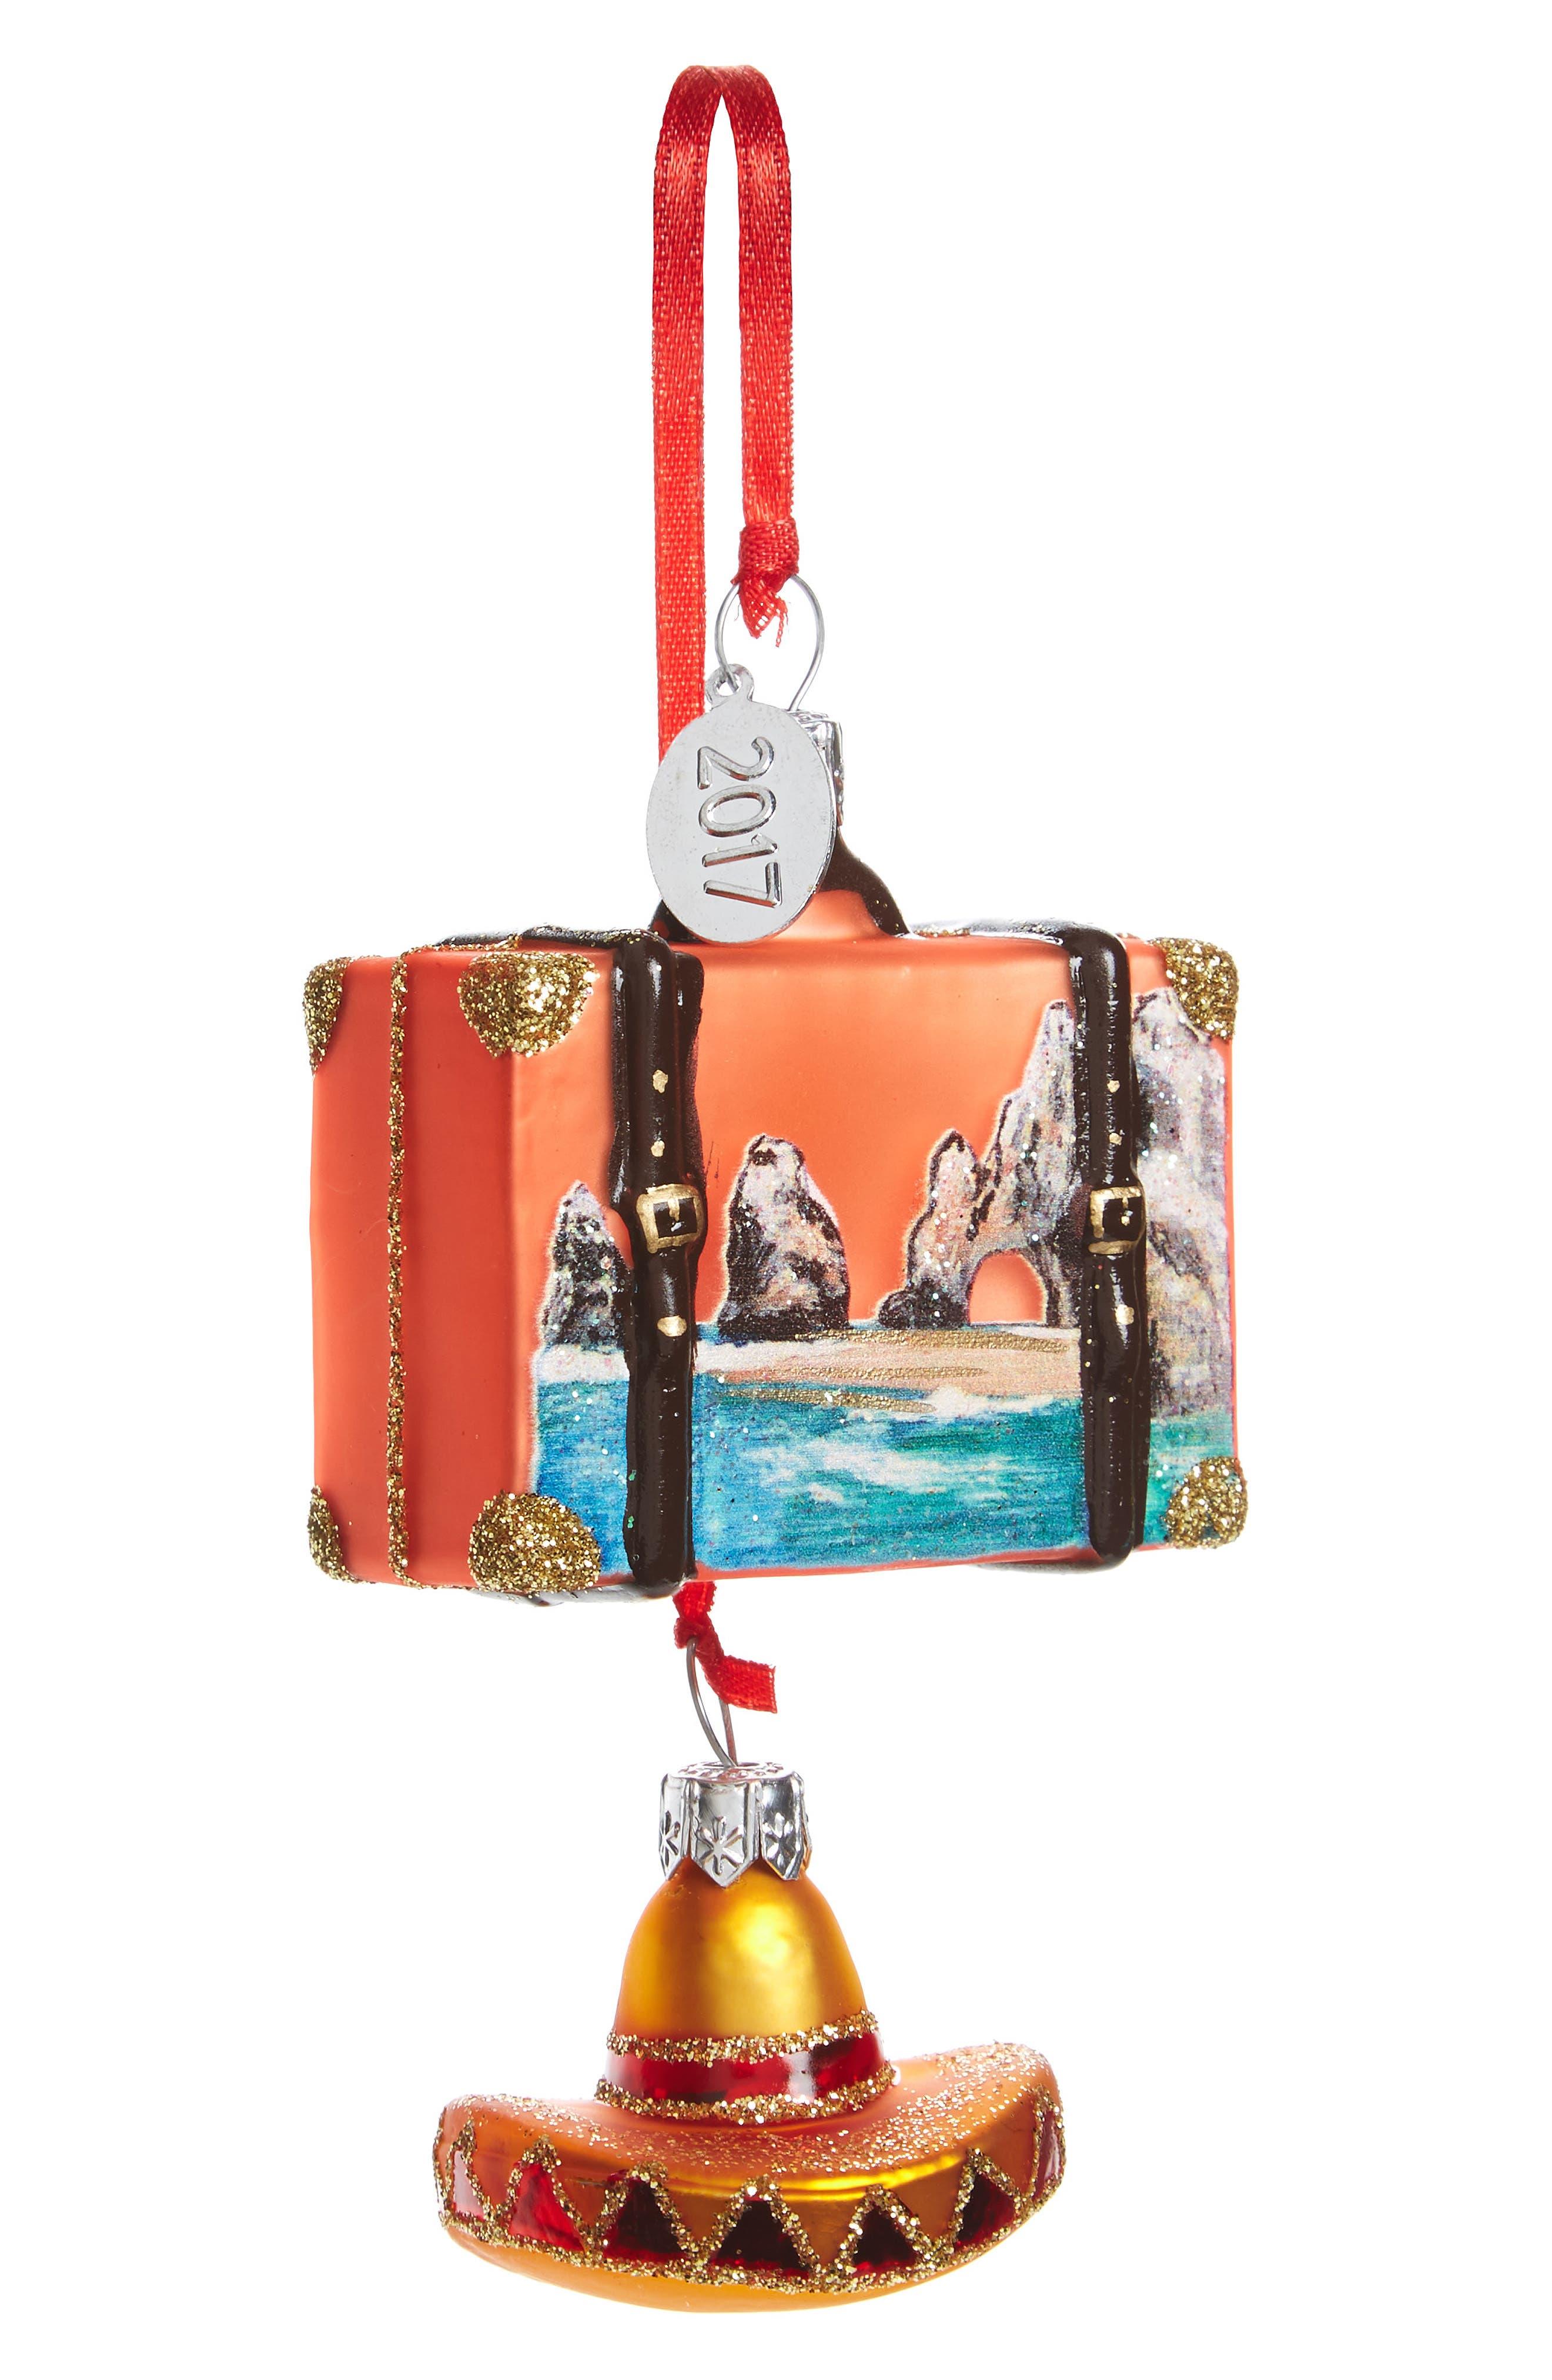 Nordstrom at Home 'Travel' Mini Ornament